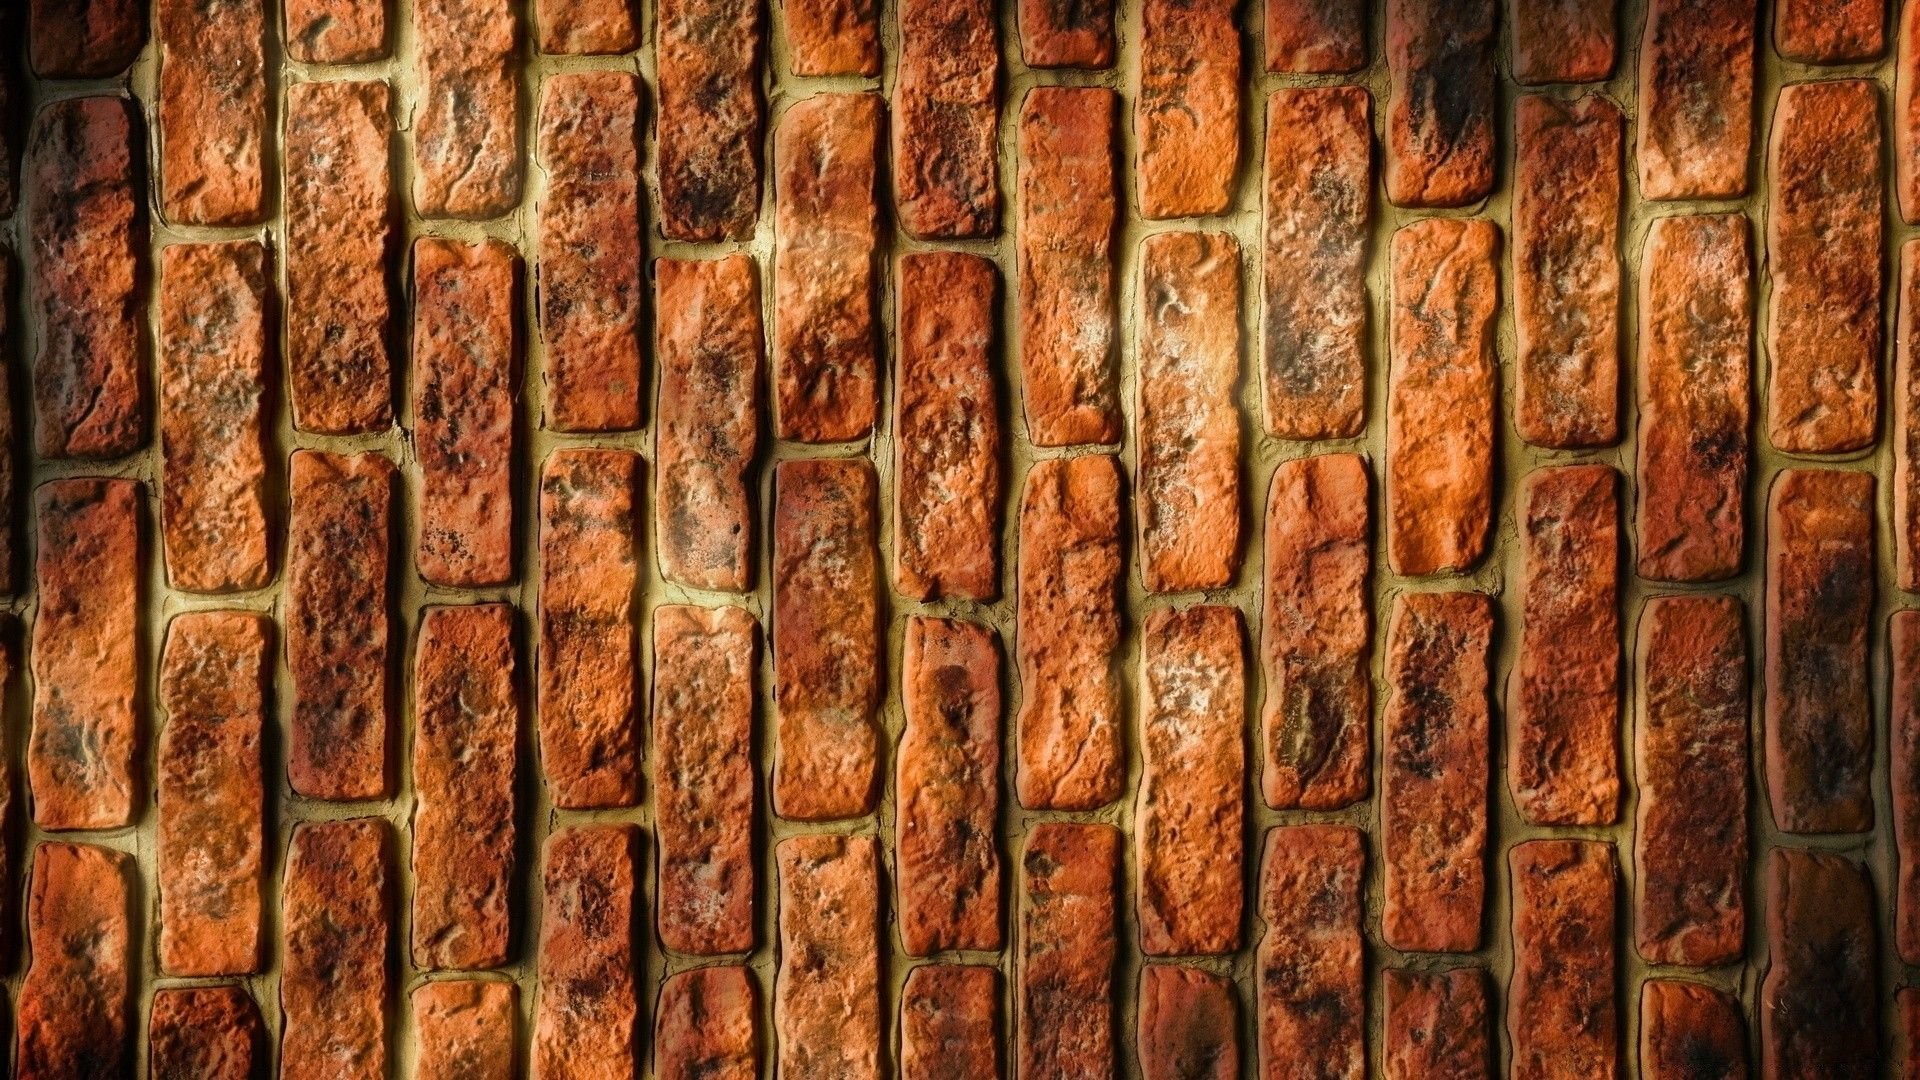 Brick Paper Backdrop download nice wallpaper